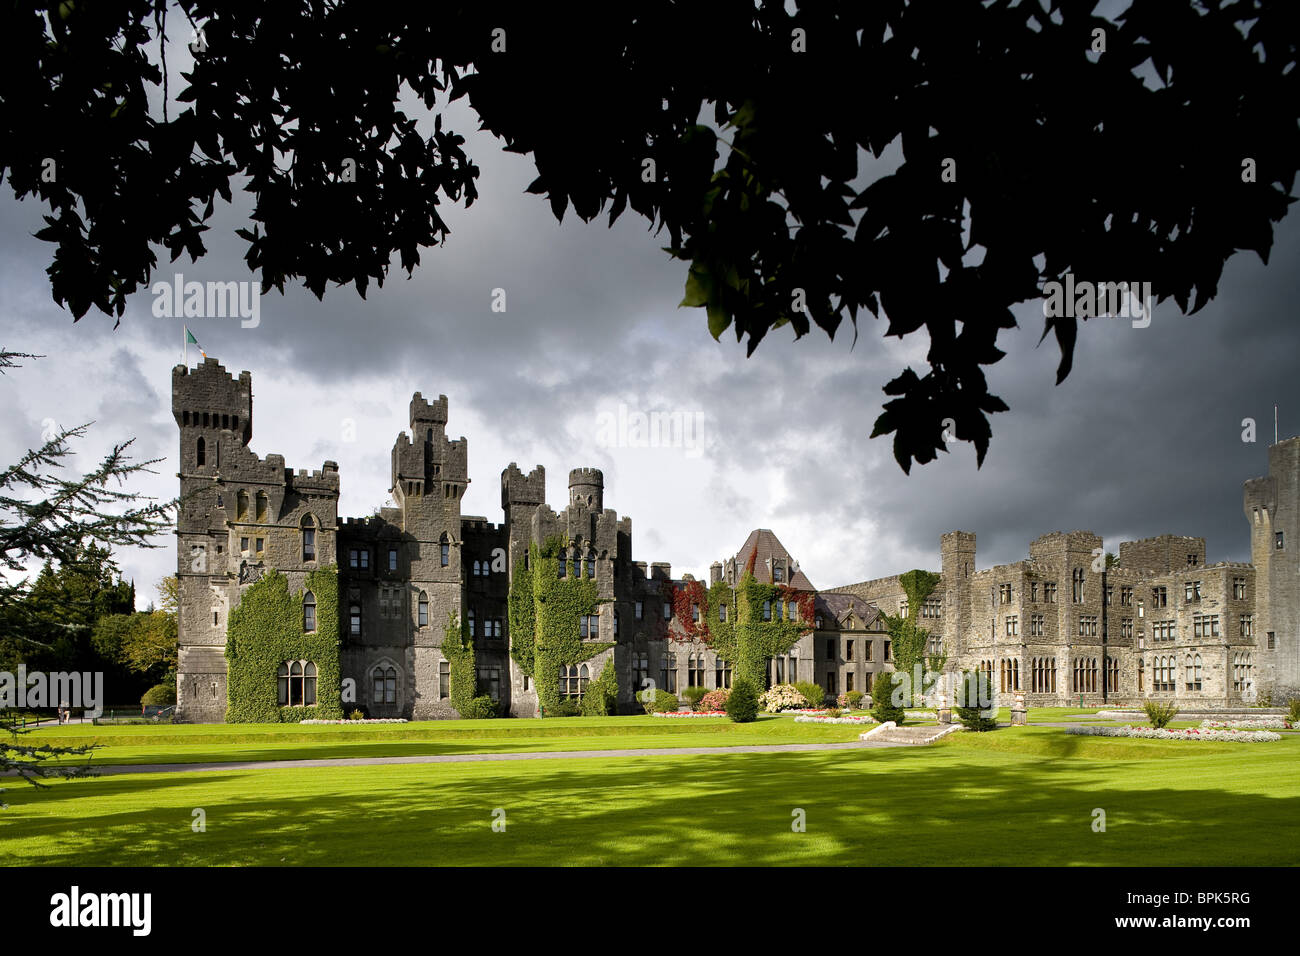 Ashford Castle near Cong, County Mayo, Ireland, Europe - Stock Image